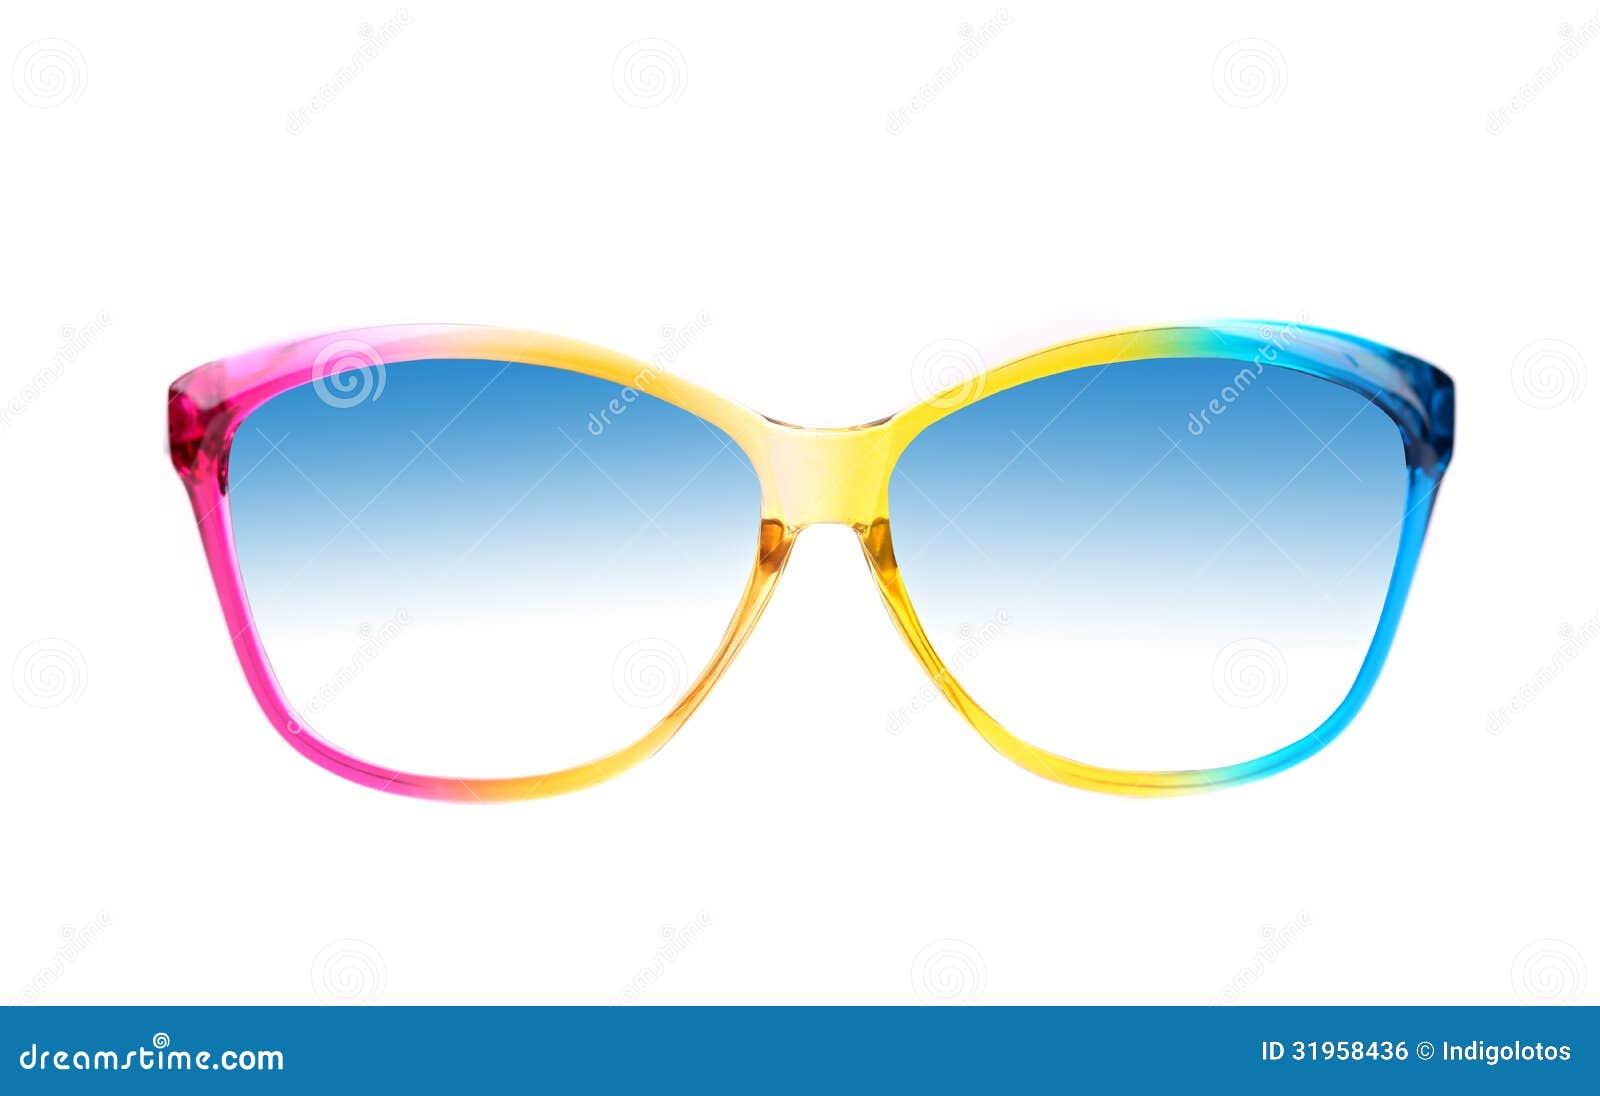 Color Sunglasses Stock Photo Image Of Shape Optical